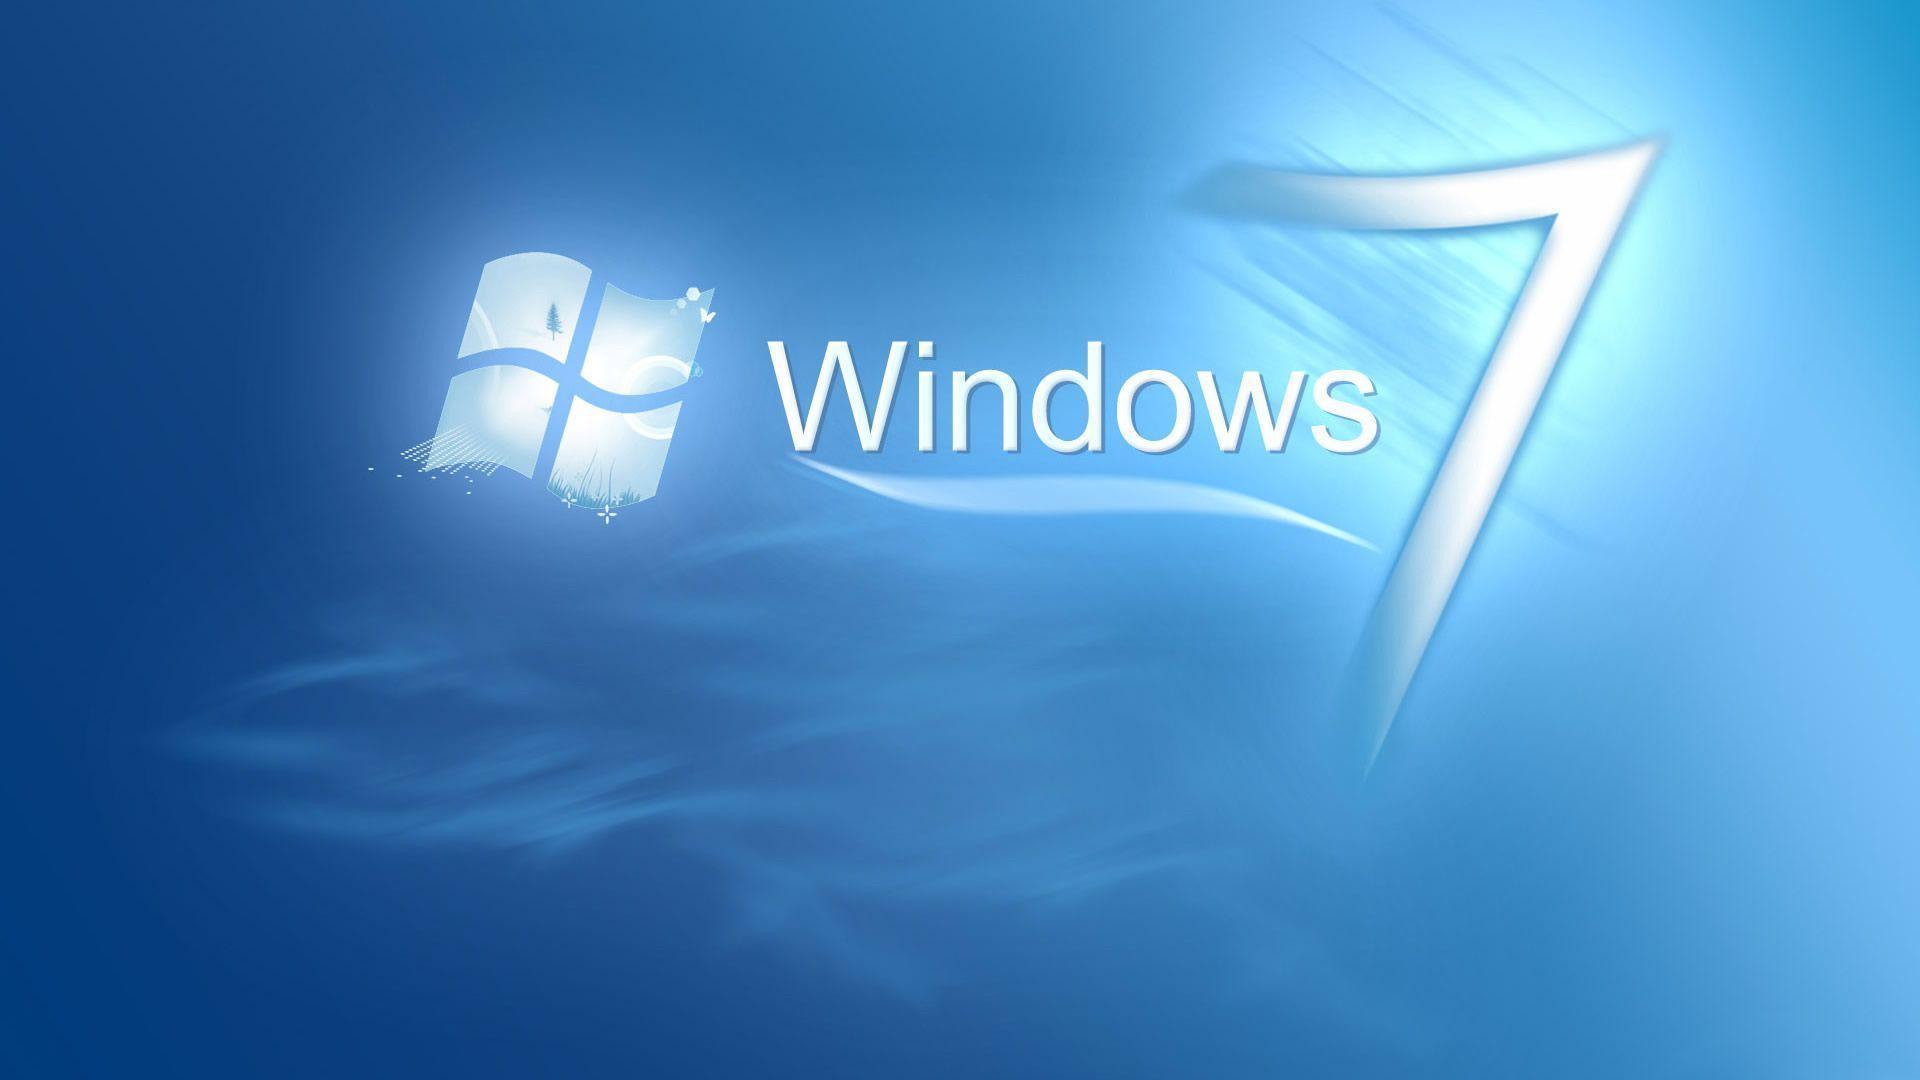 Windows 7 Wallpapers 1920x1080 - Wallpaper Cave